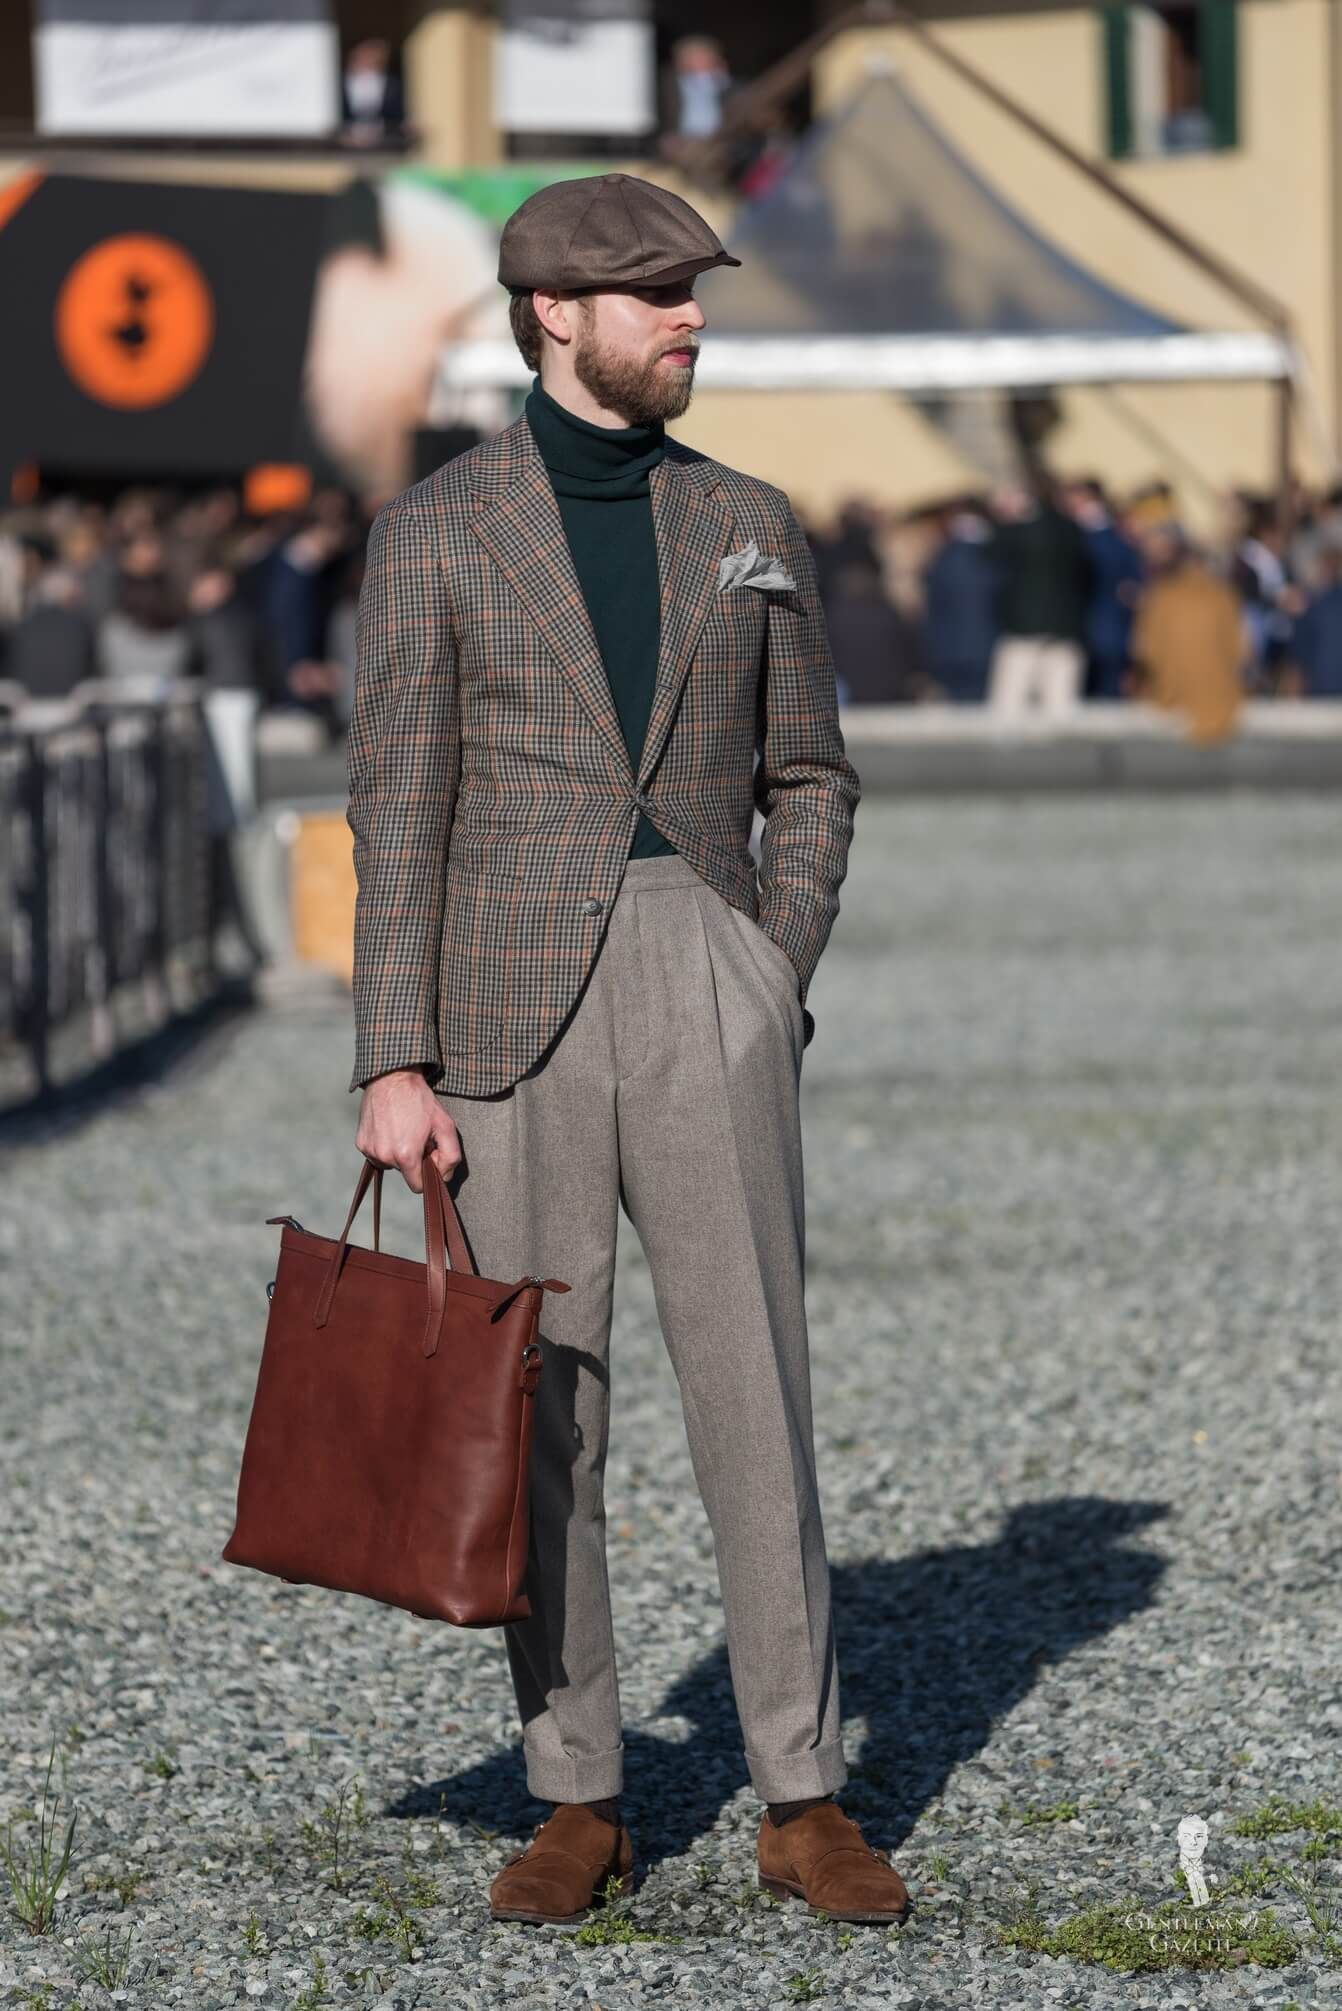 Business Casual Men's Attire & Dress Code Explained